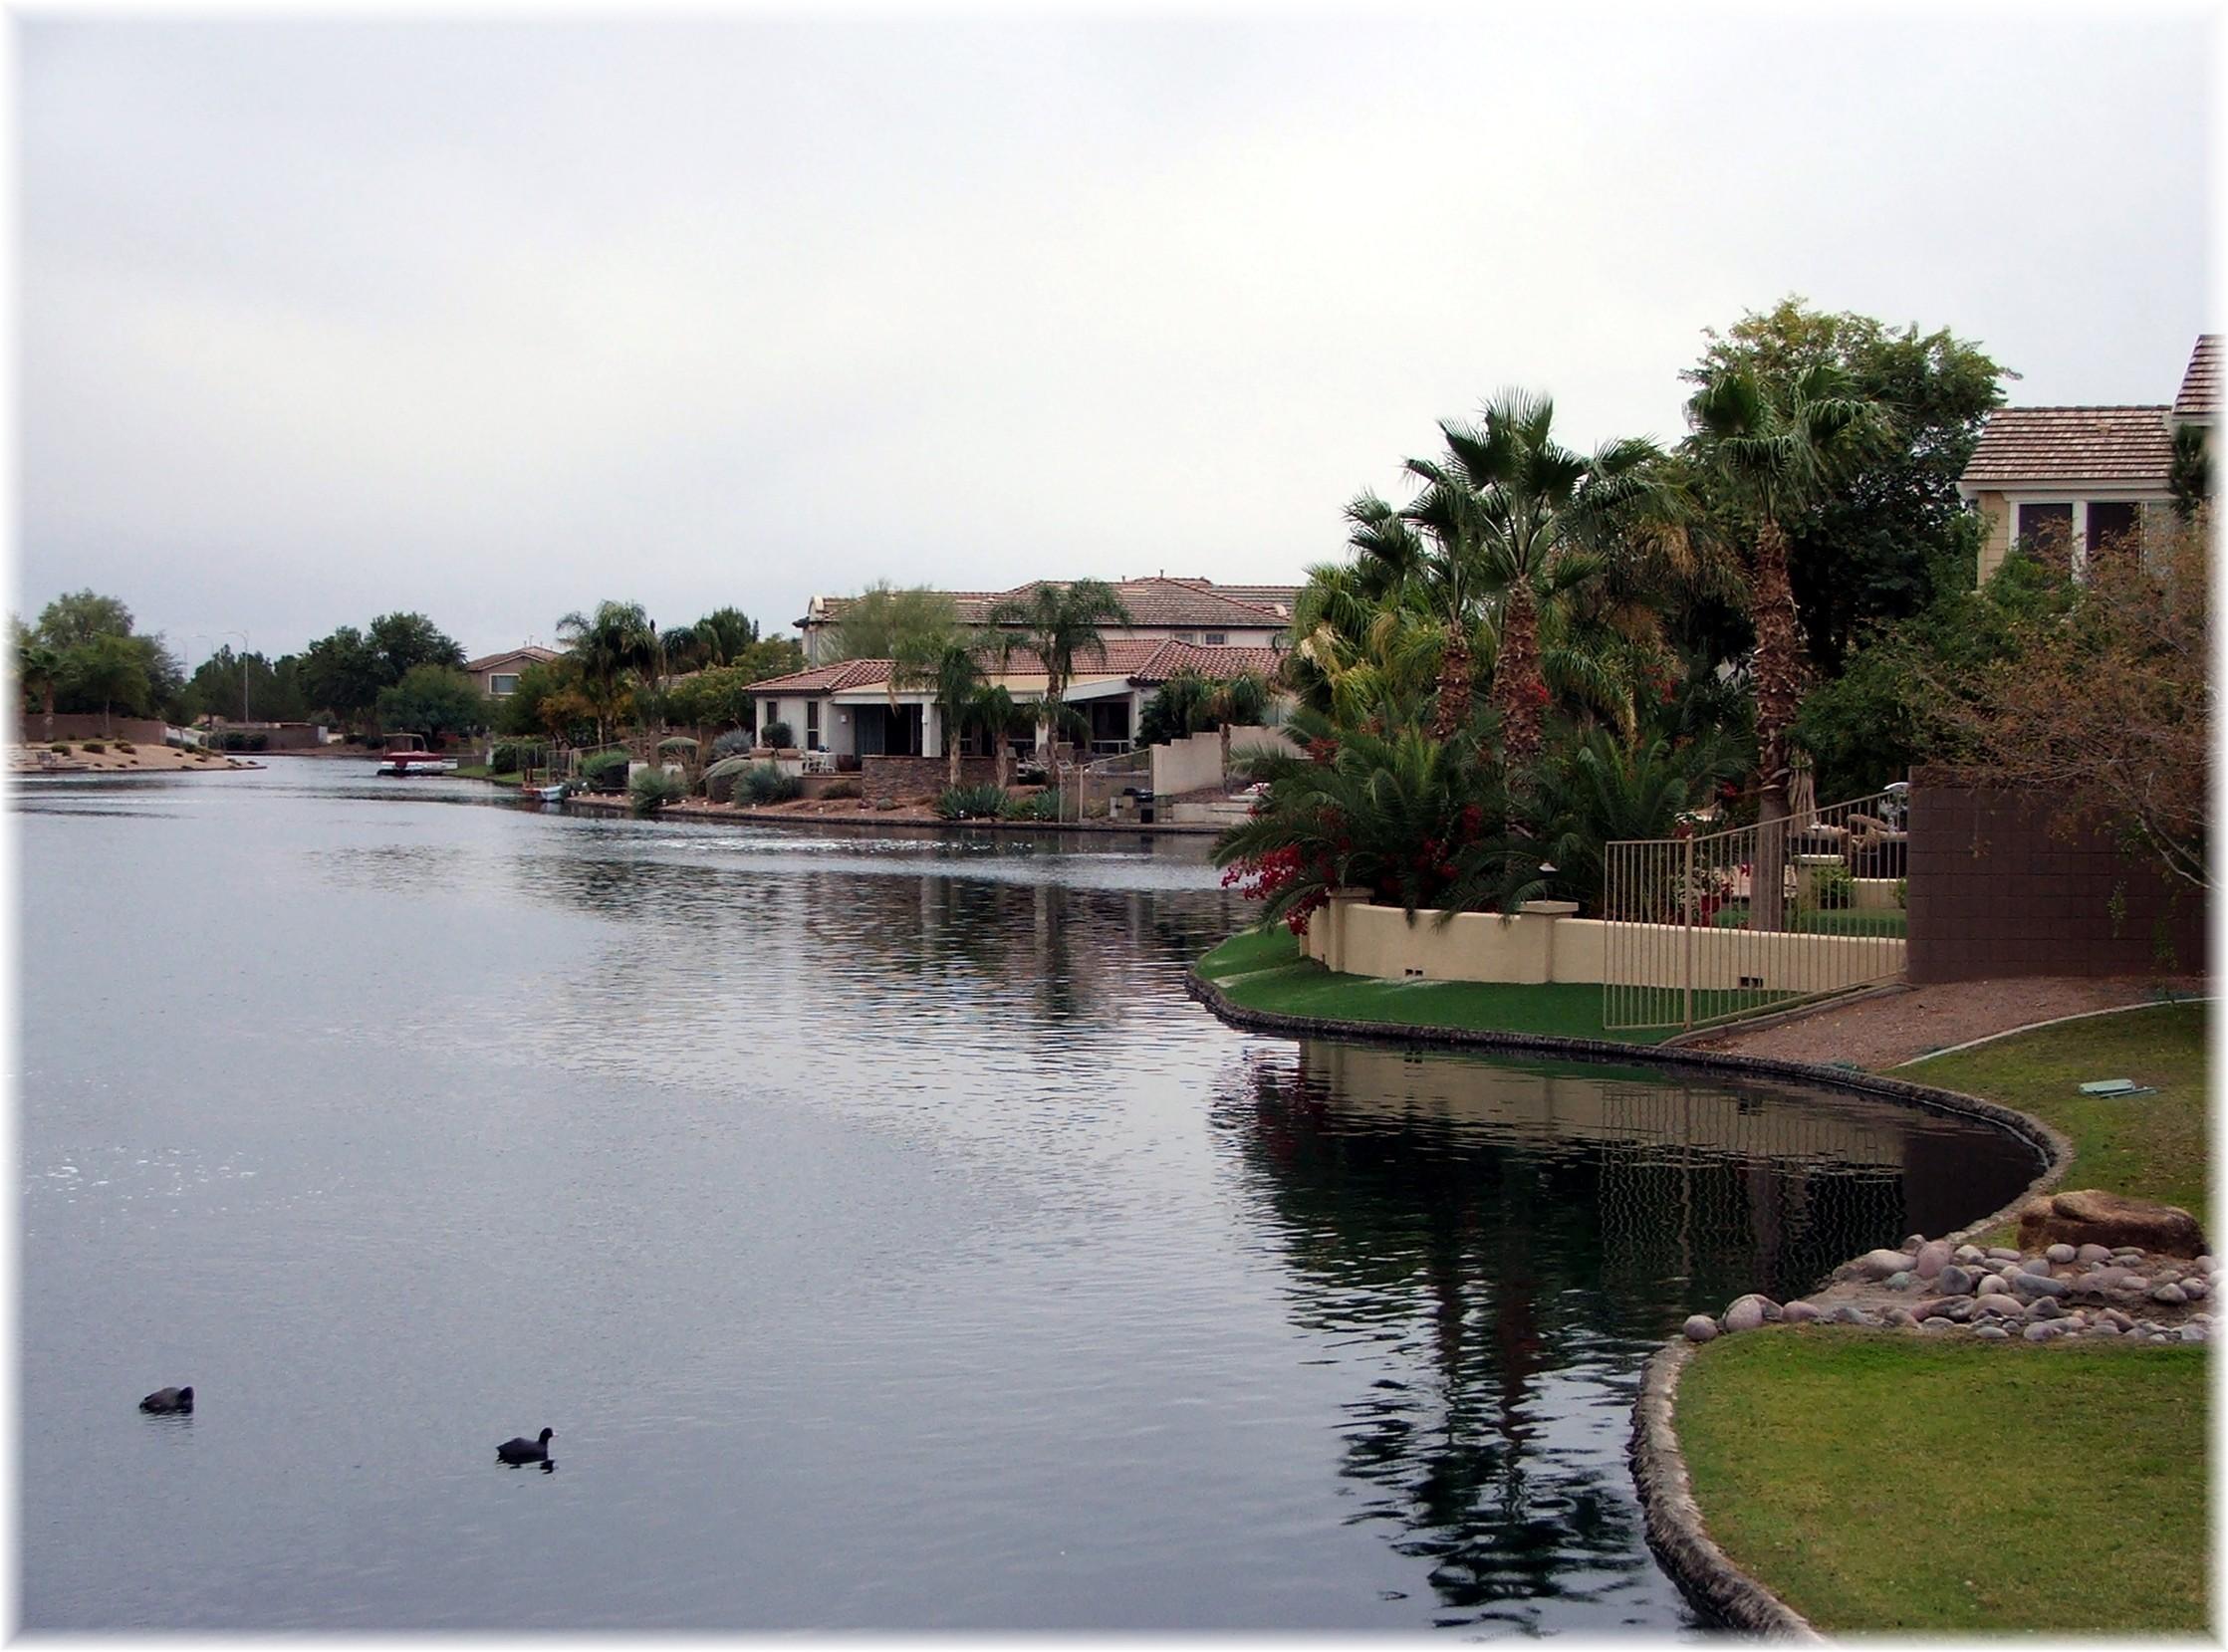 pinelake estates waterfront homes in chandler az phoenix arizona